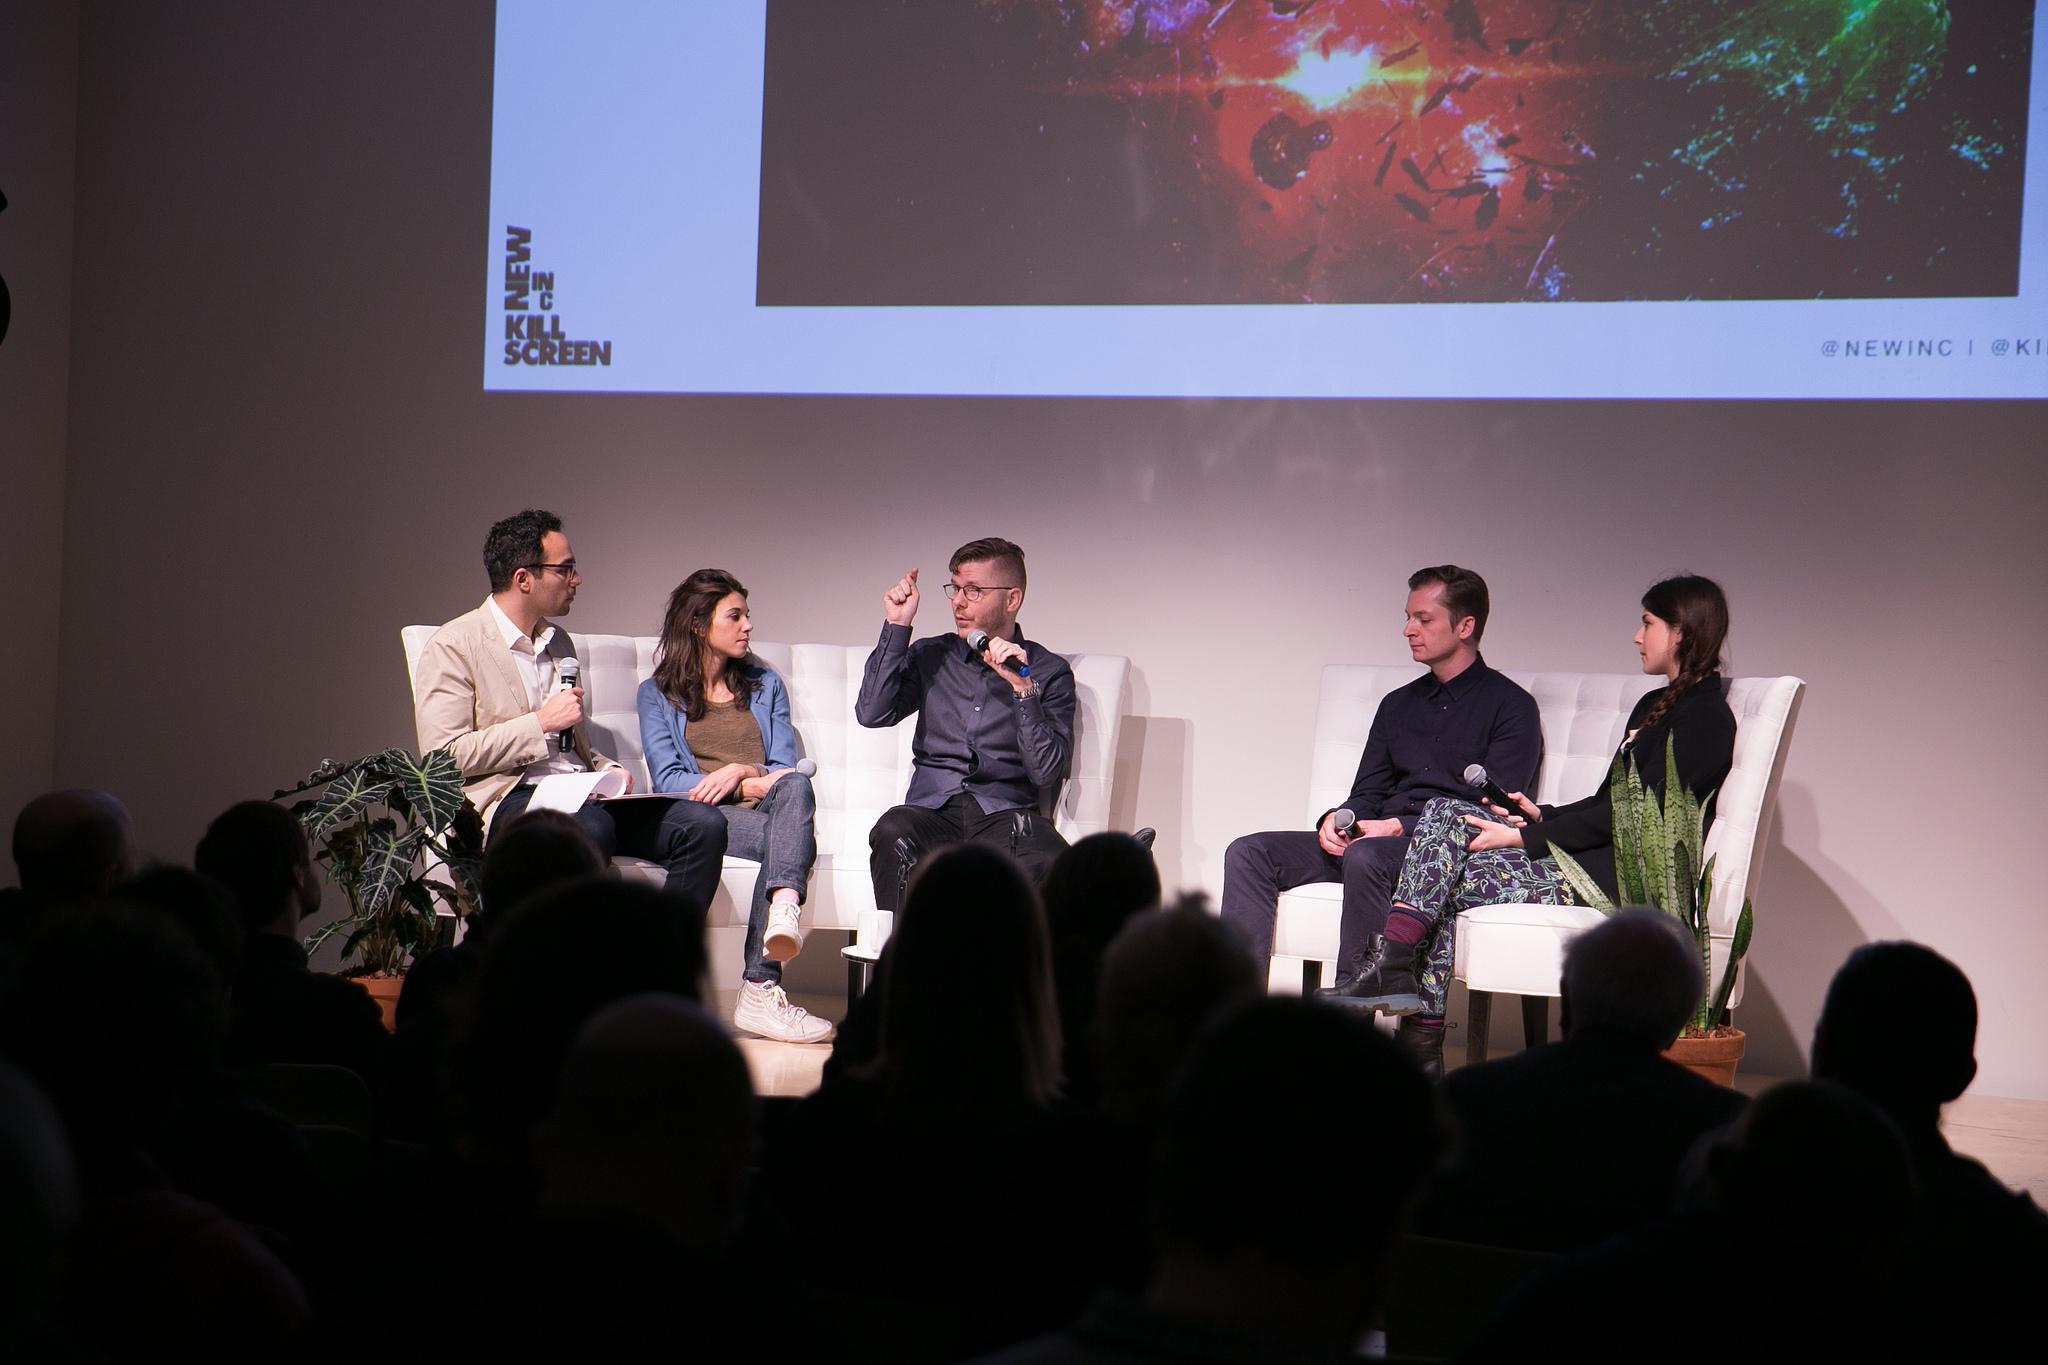 VR: THE LAST MEDIUM?    With Jessica Brillhart, Torfi Frans Olafsson, Neil McFarland, and Rachel Rossin